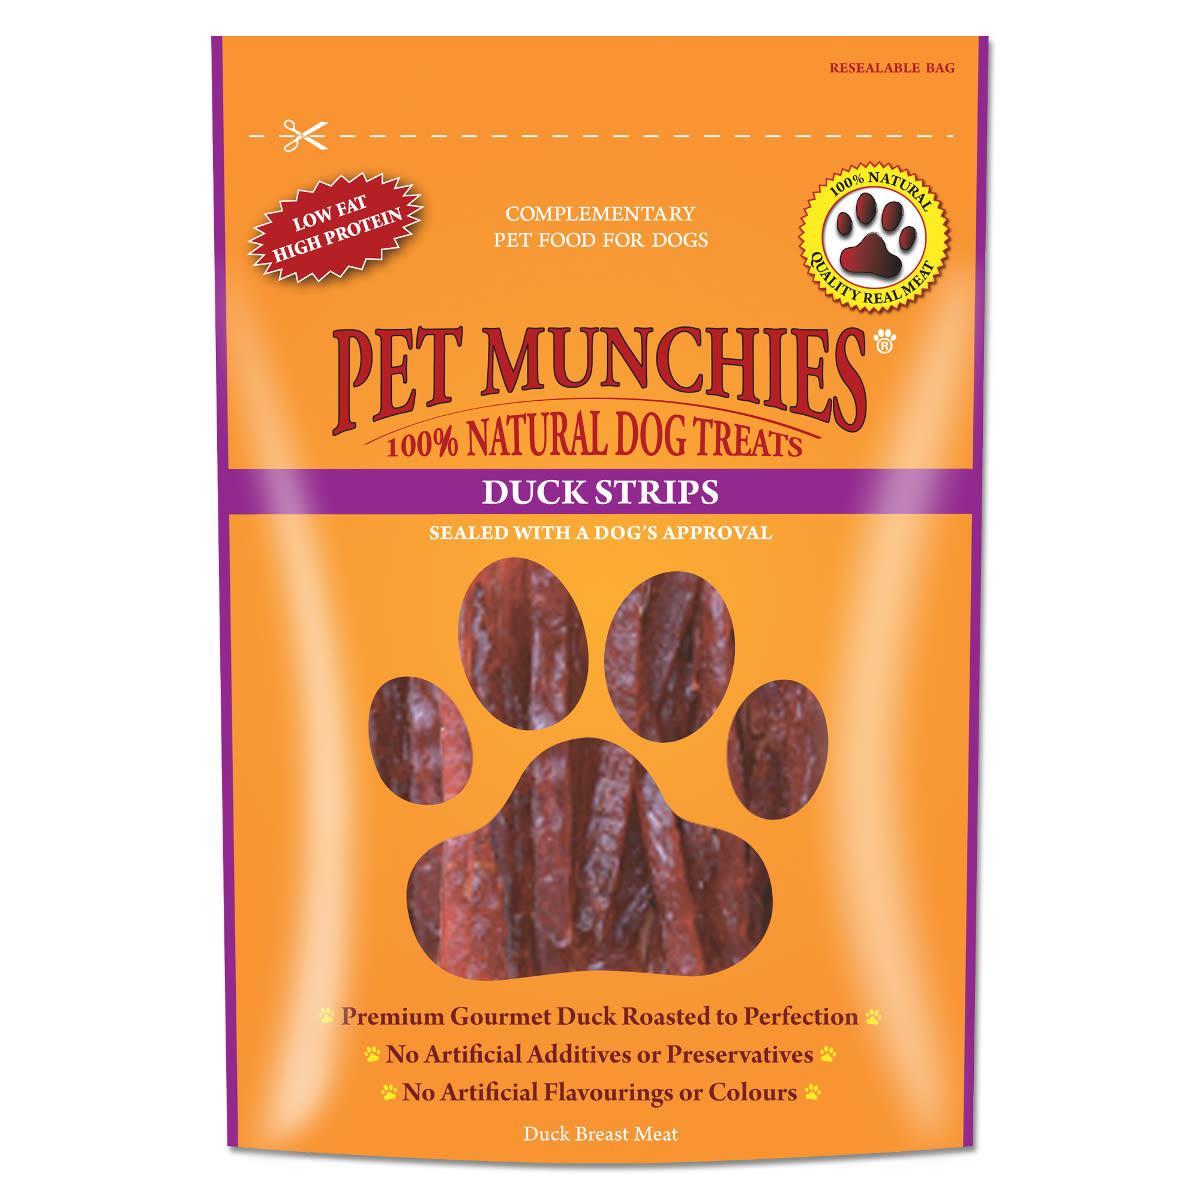 Pet Munchies Dog Treats - Duck